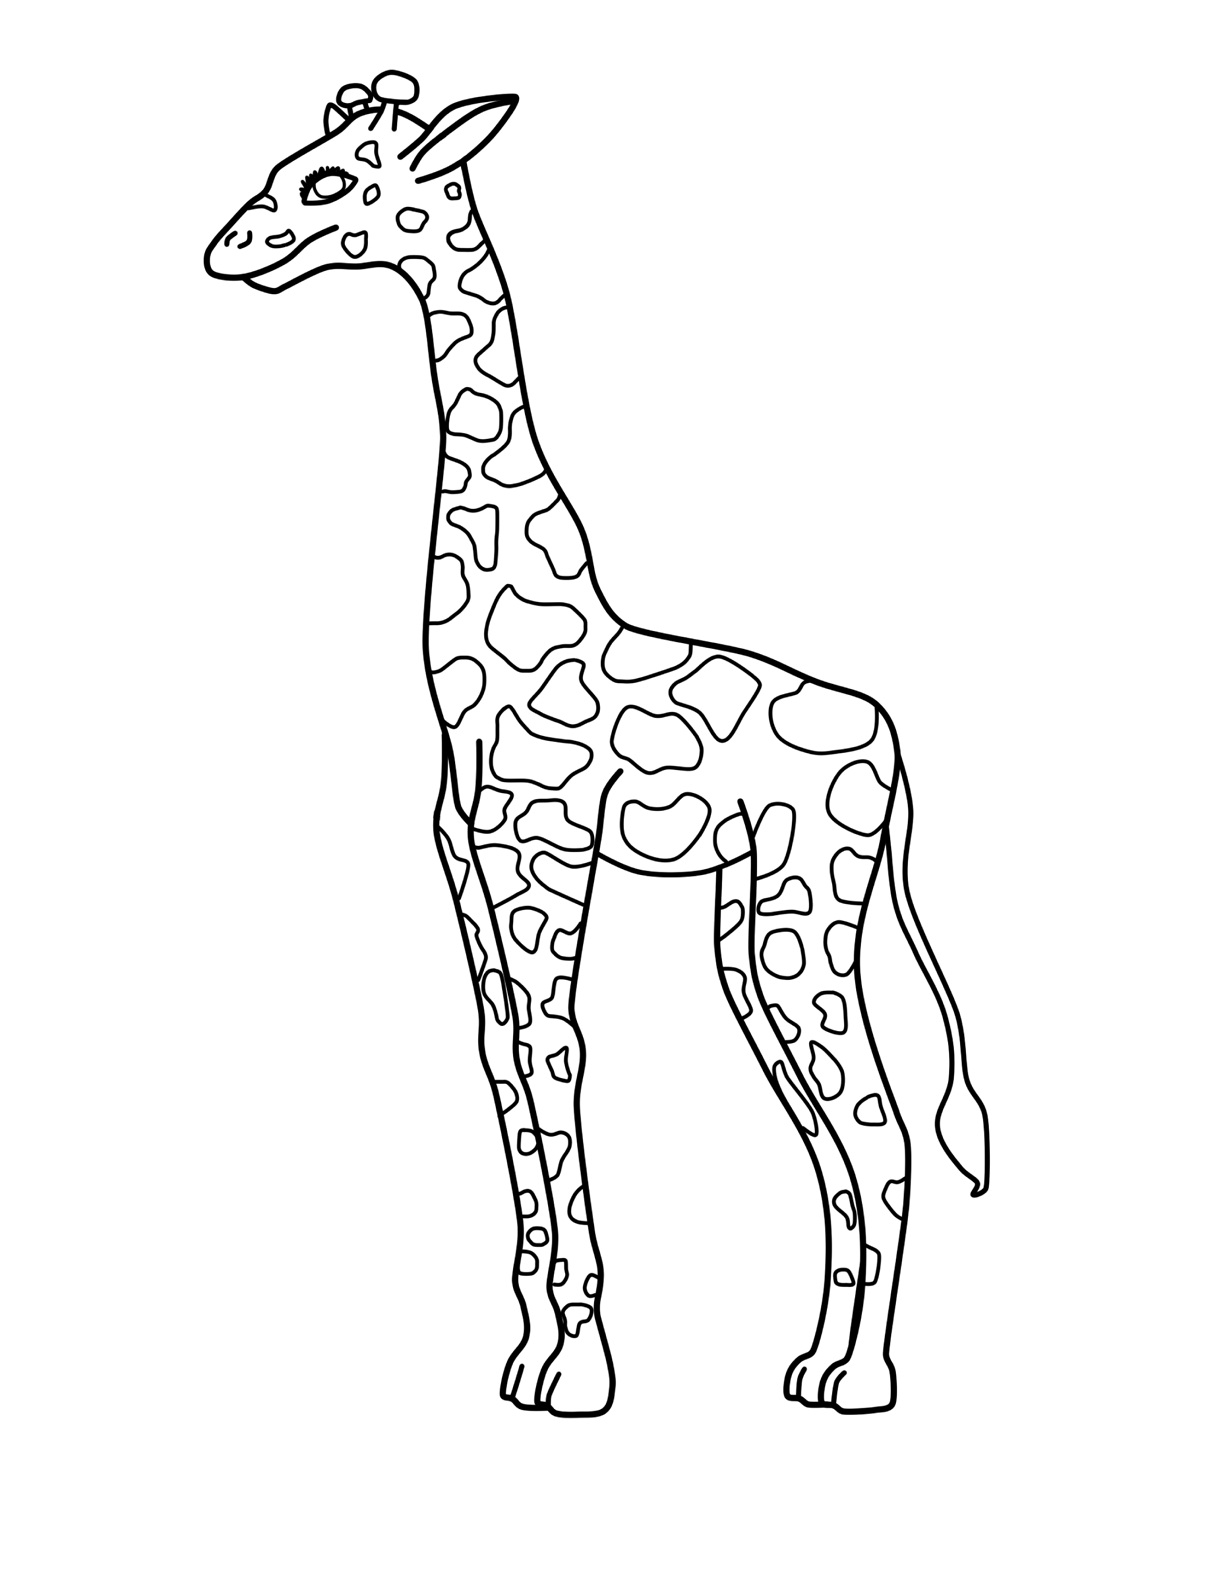 Giraffe To Color : giraffe, color, Printable, Giraffe, Coloring, Pages